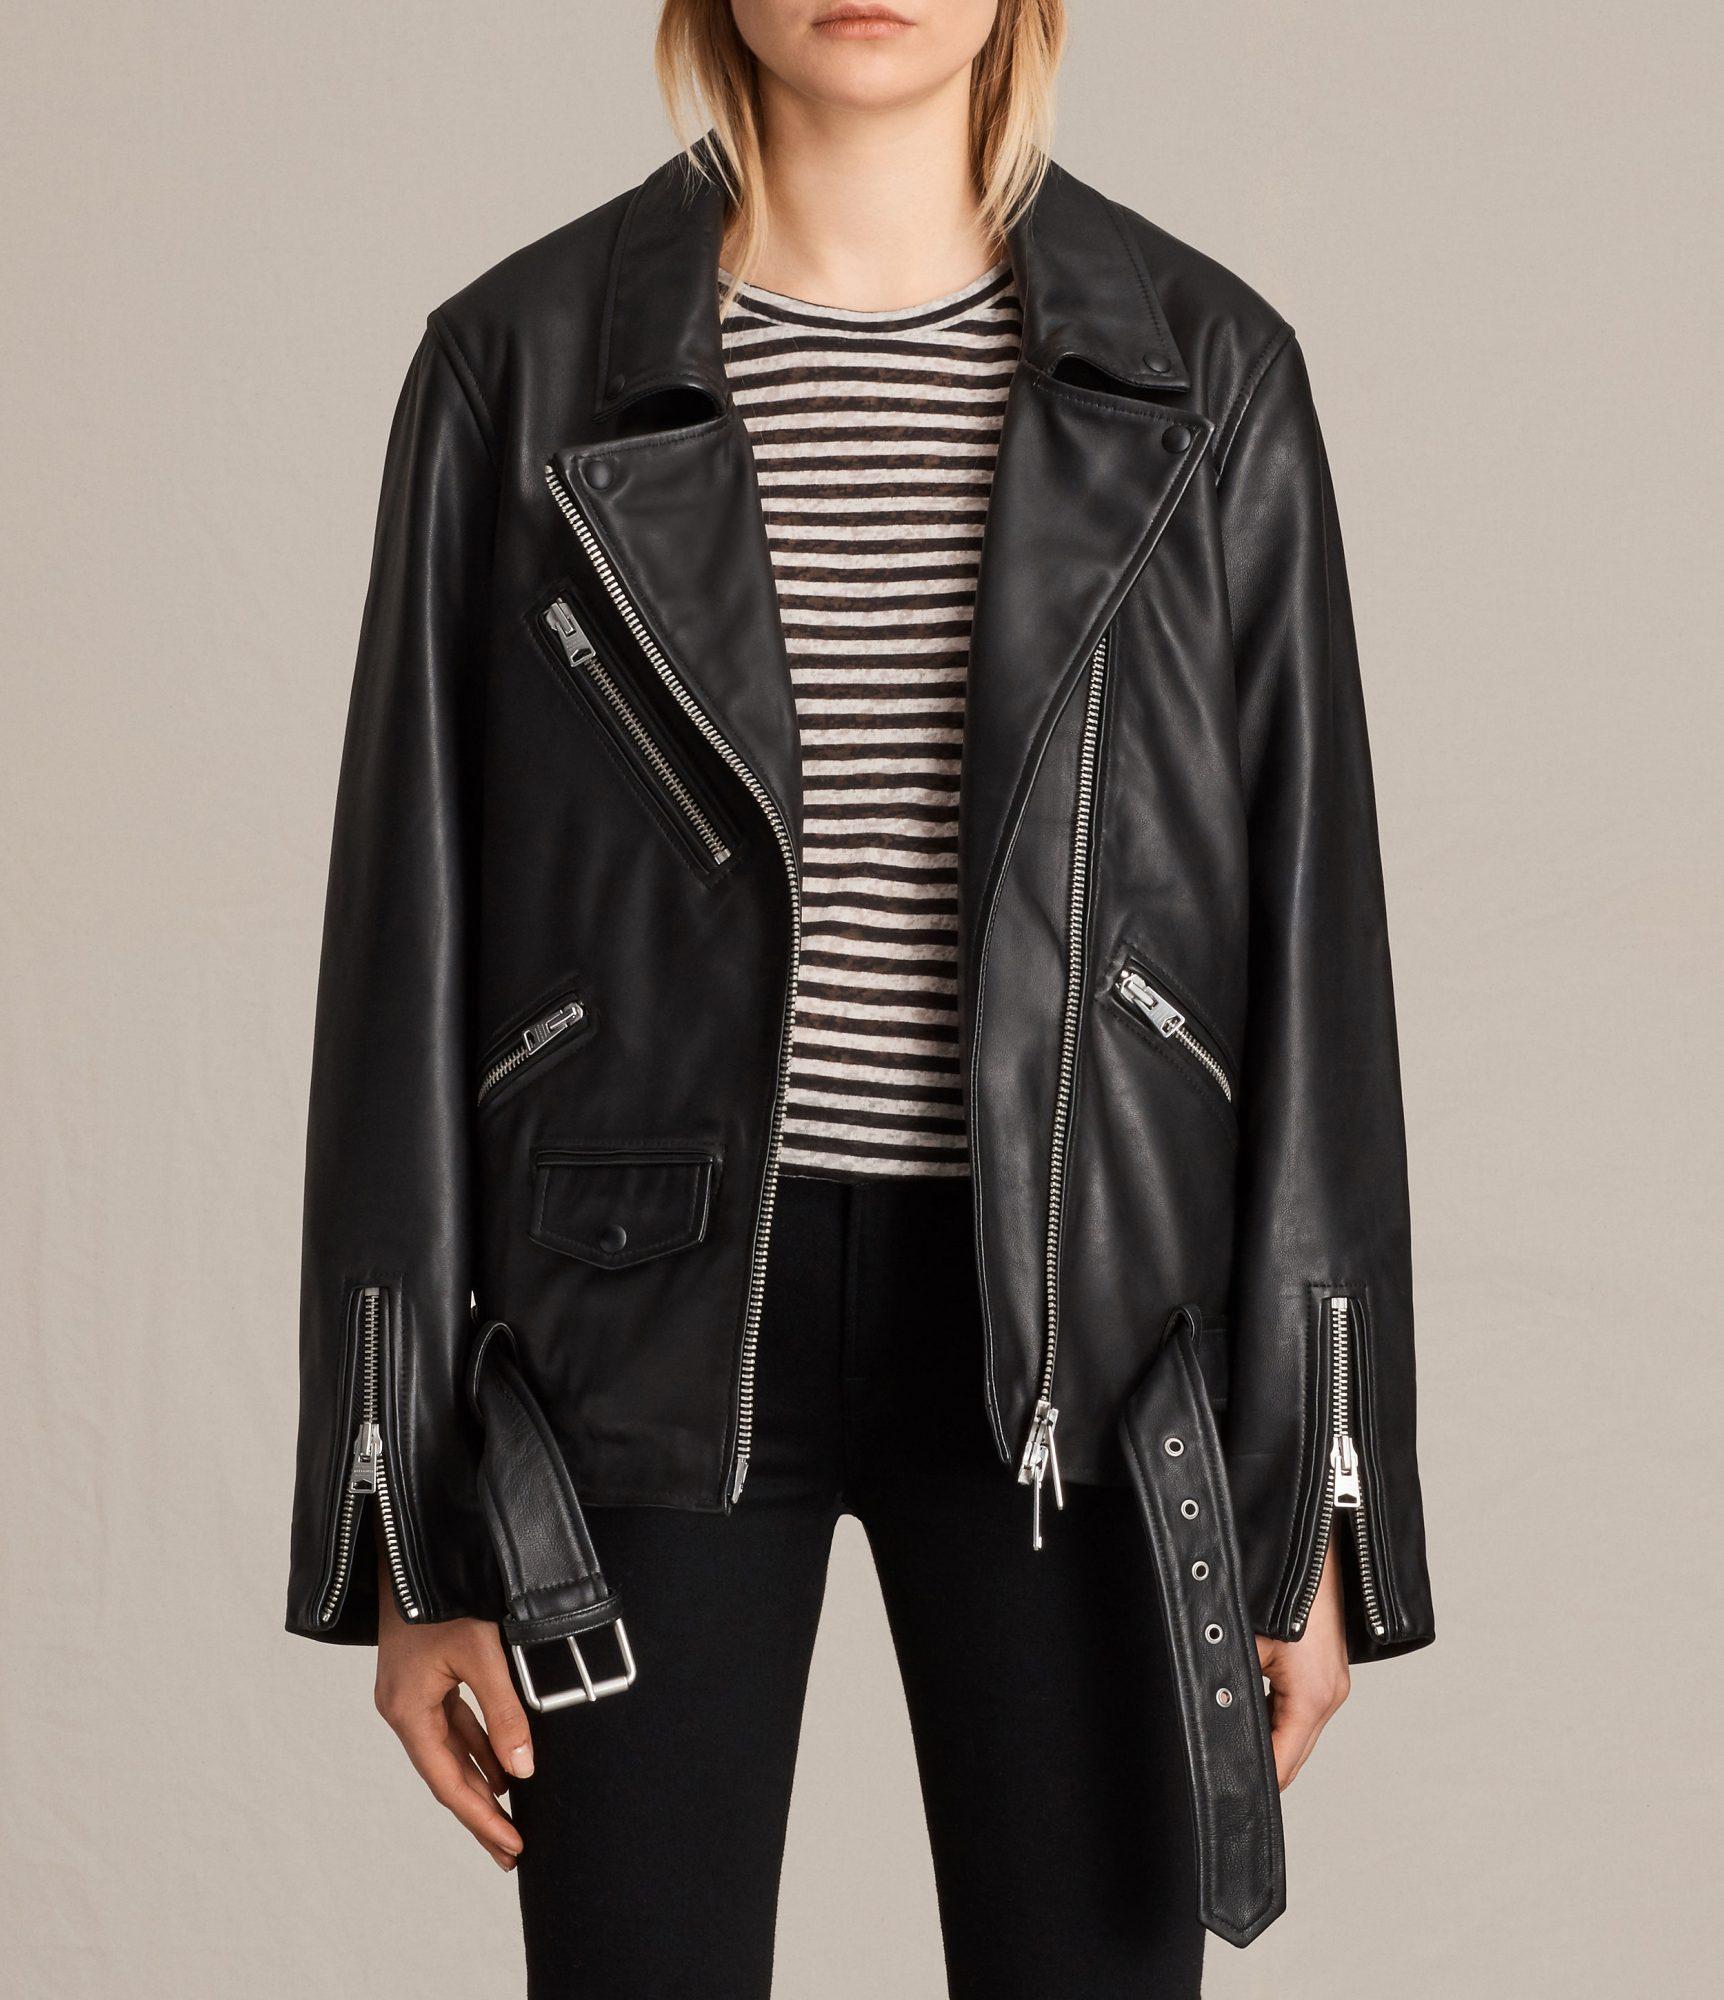 leather-jacket.jpg